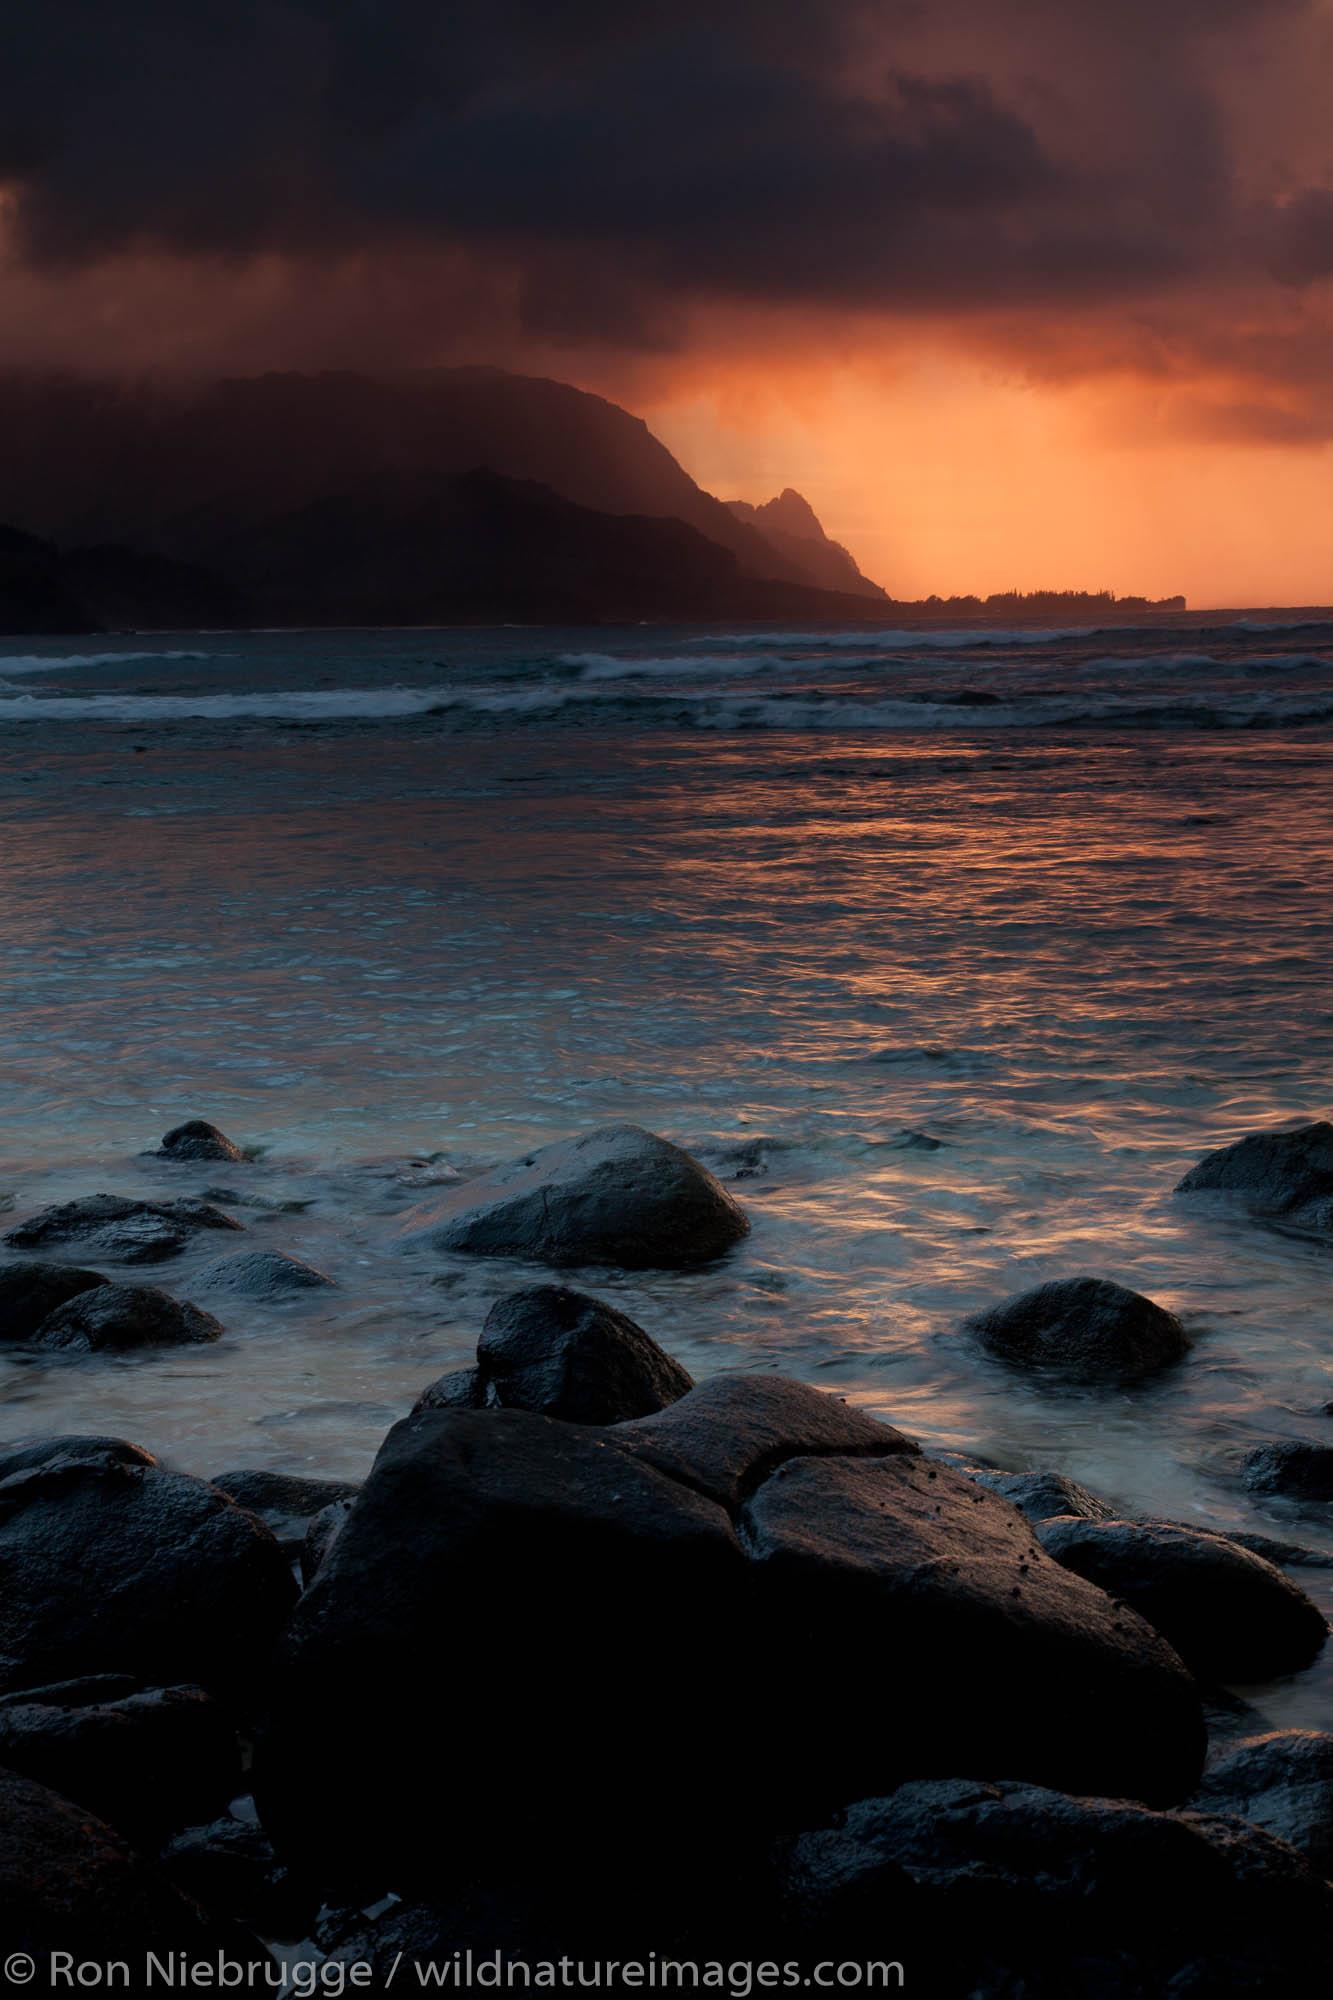 Sunset Hanalei Bay, Looking towards the Na Pali Coast from Hanalei Bay, Kauai, Hawaii.